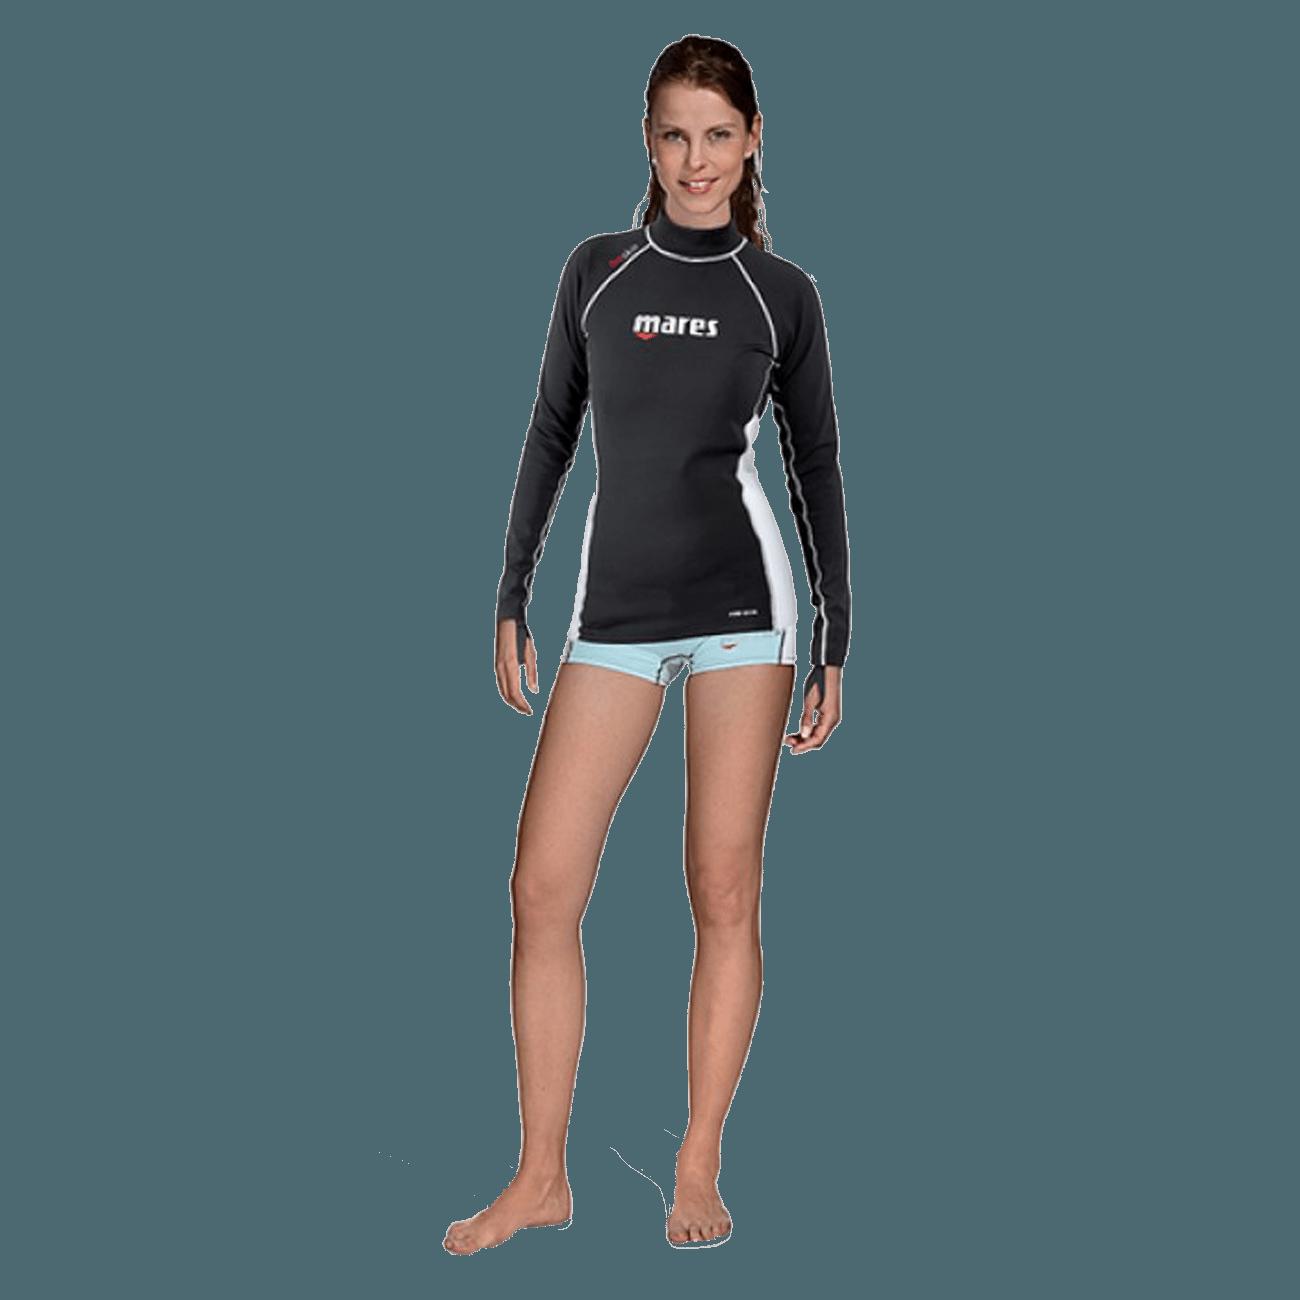 Mares Fire Skin Long Sleeve She Dives | Mares Rashguards | Mares Singapore